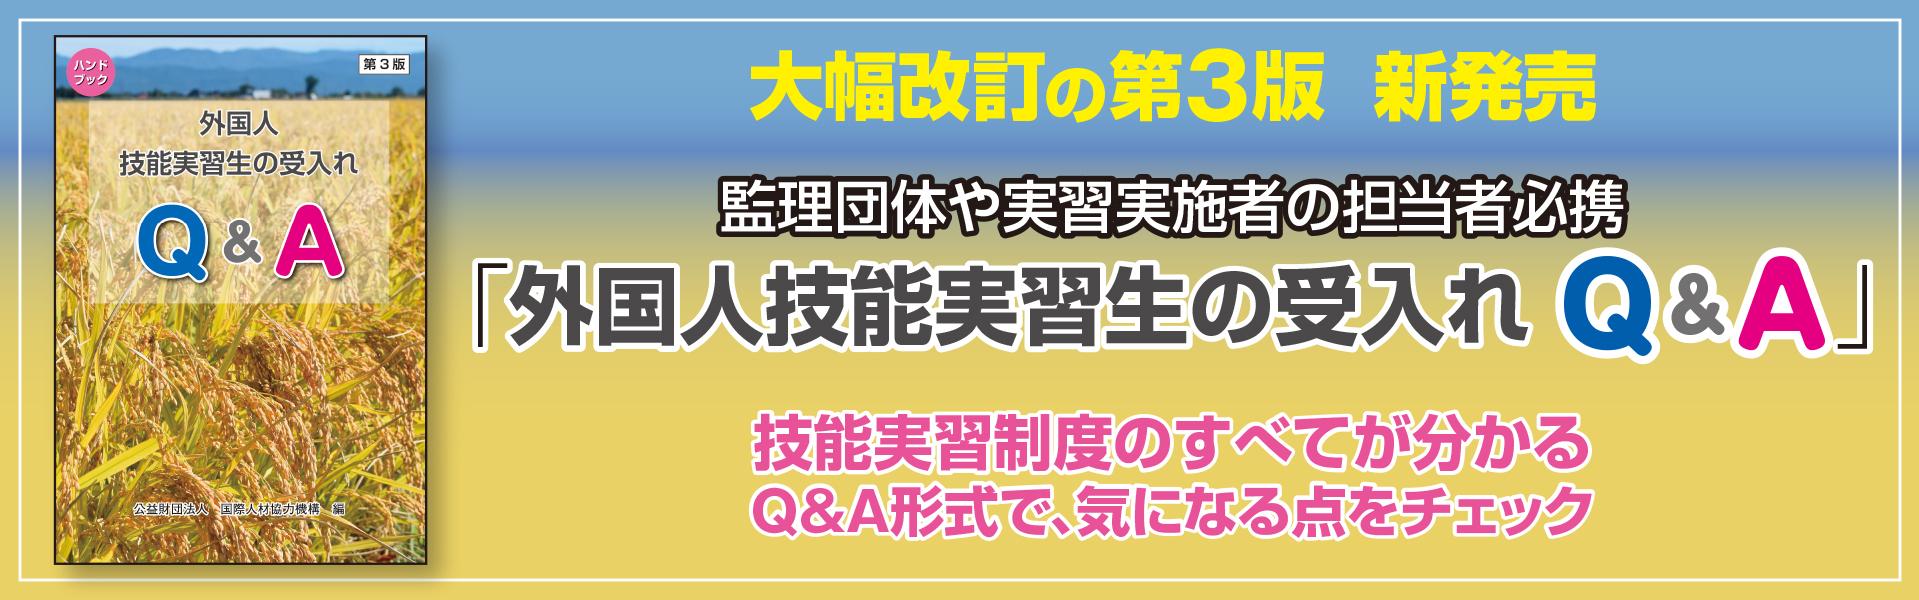 Q&A第3版